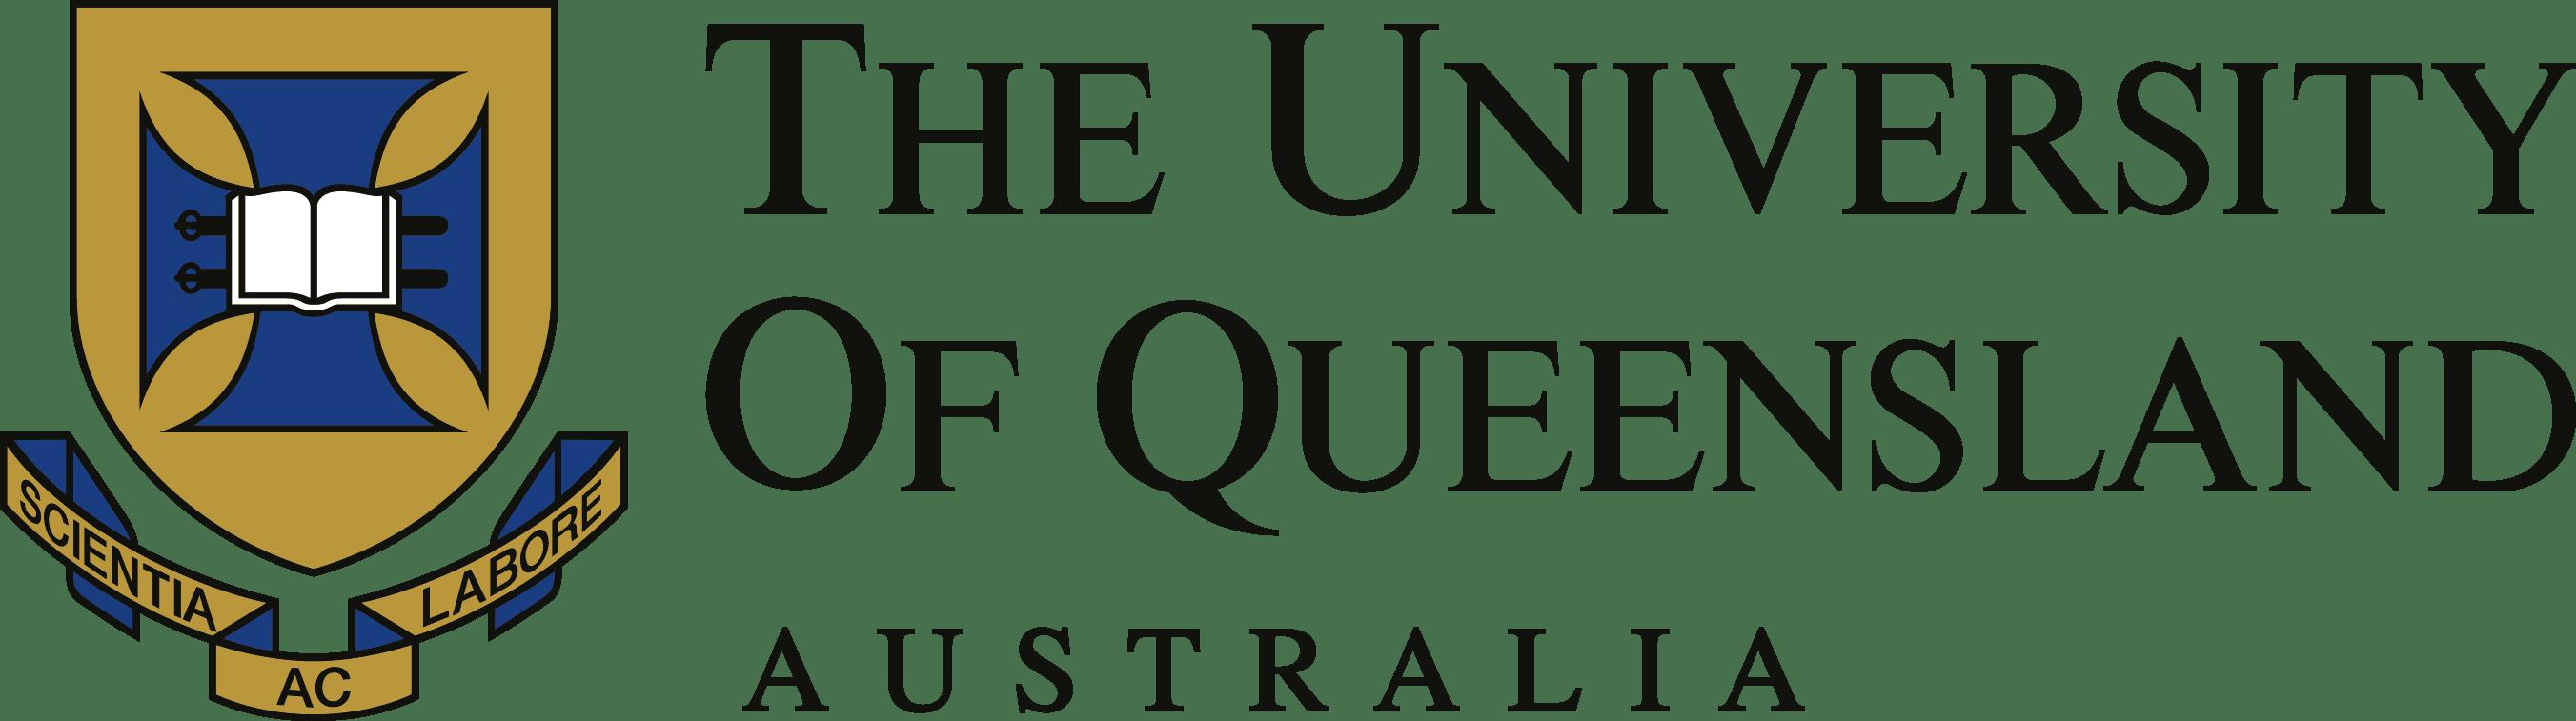 Aprender inglés en la Universidad de Queensland